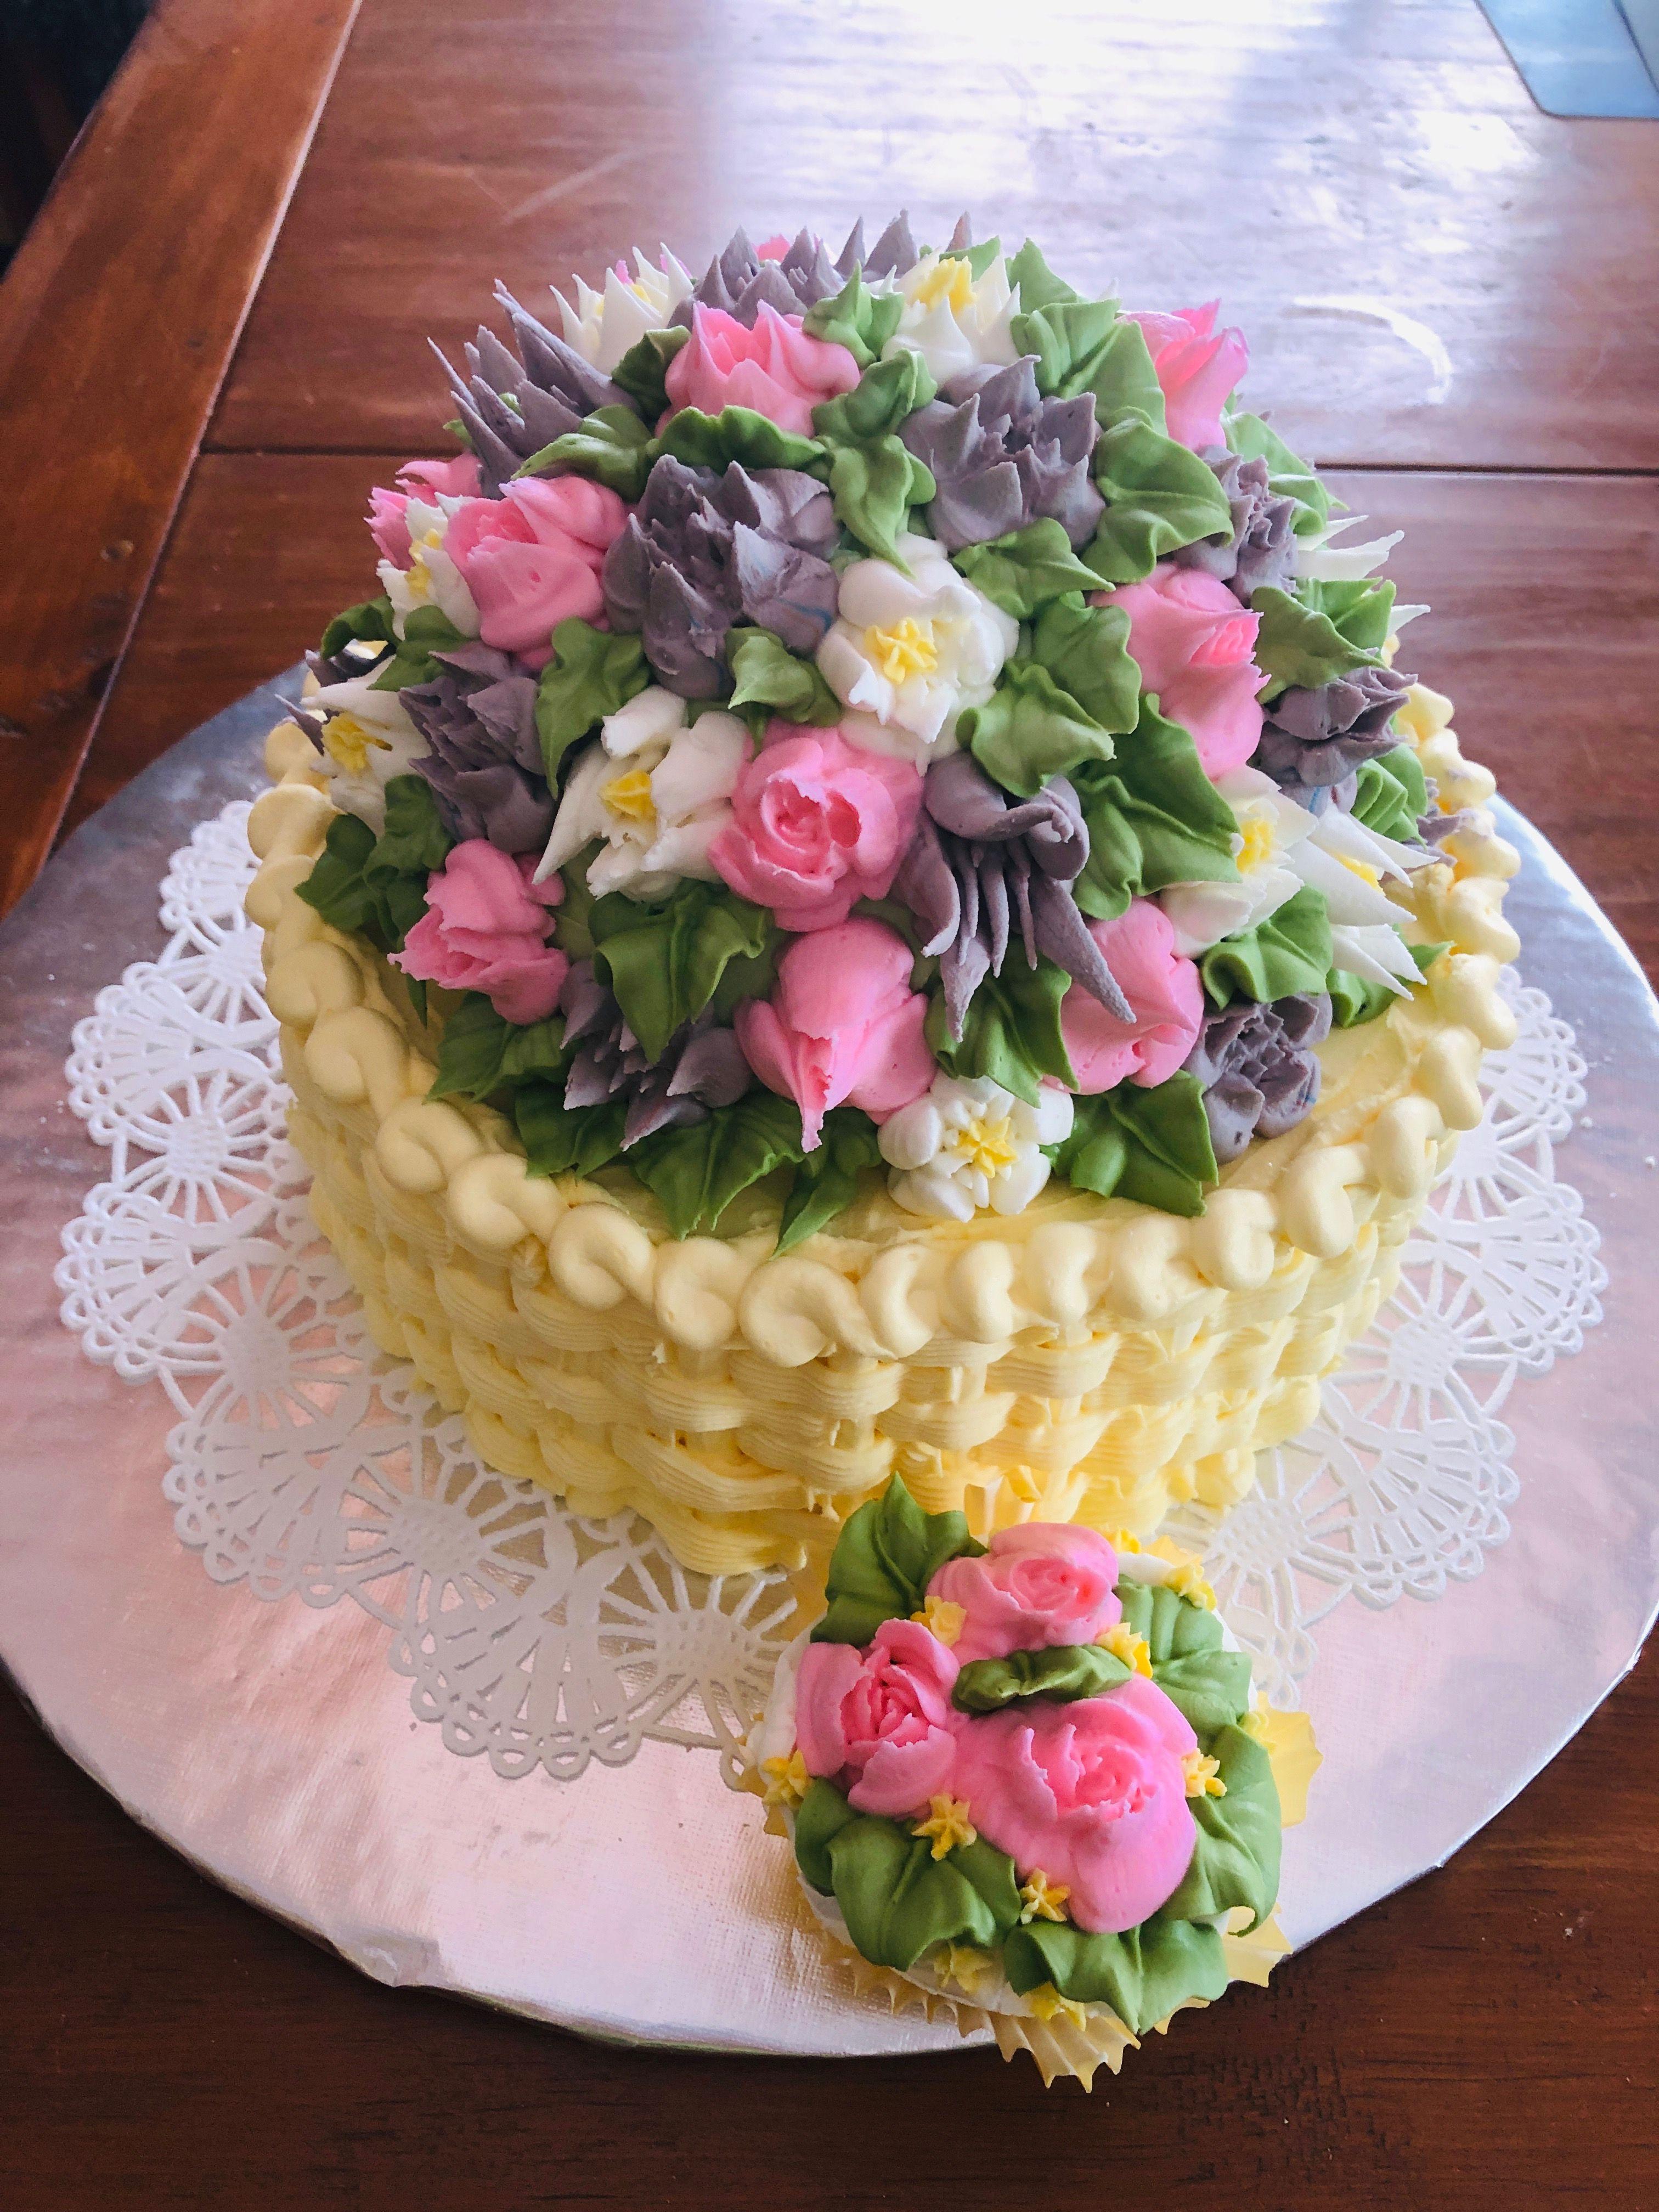 Easter basket cake by joanne nichols chatterbox bakery